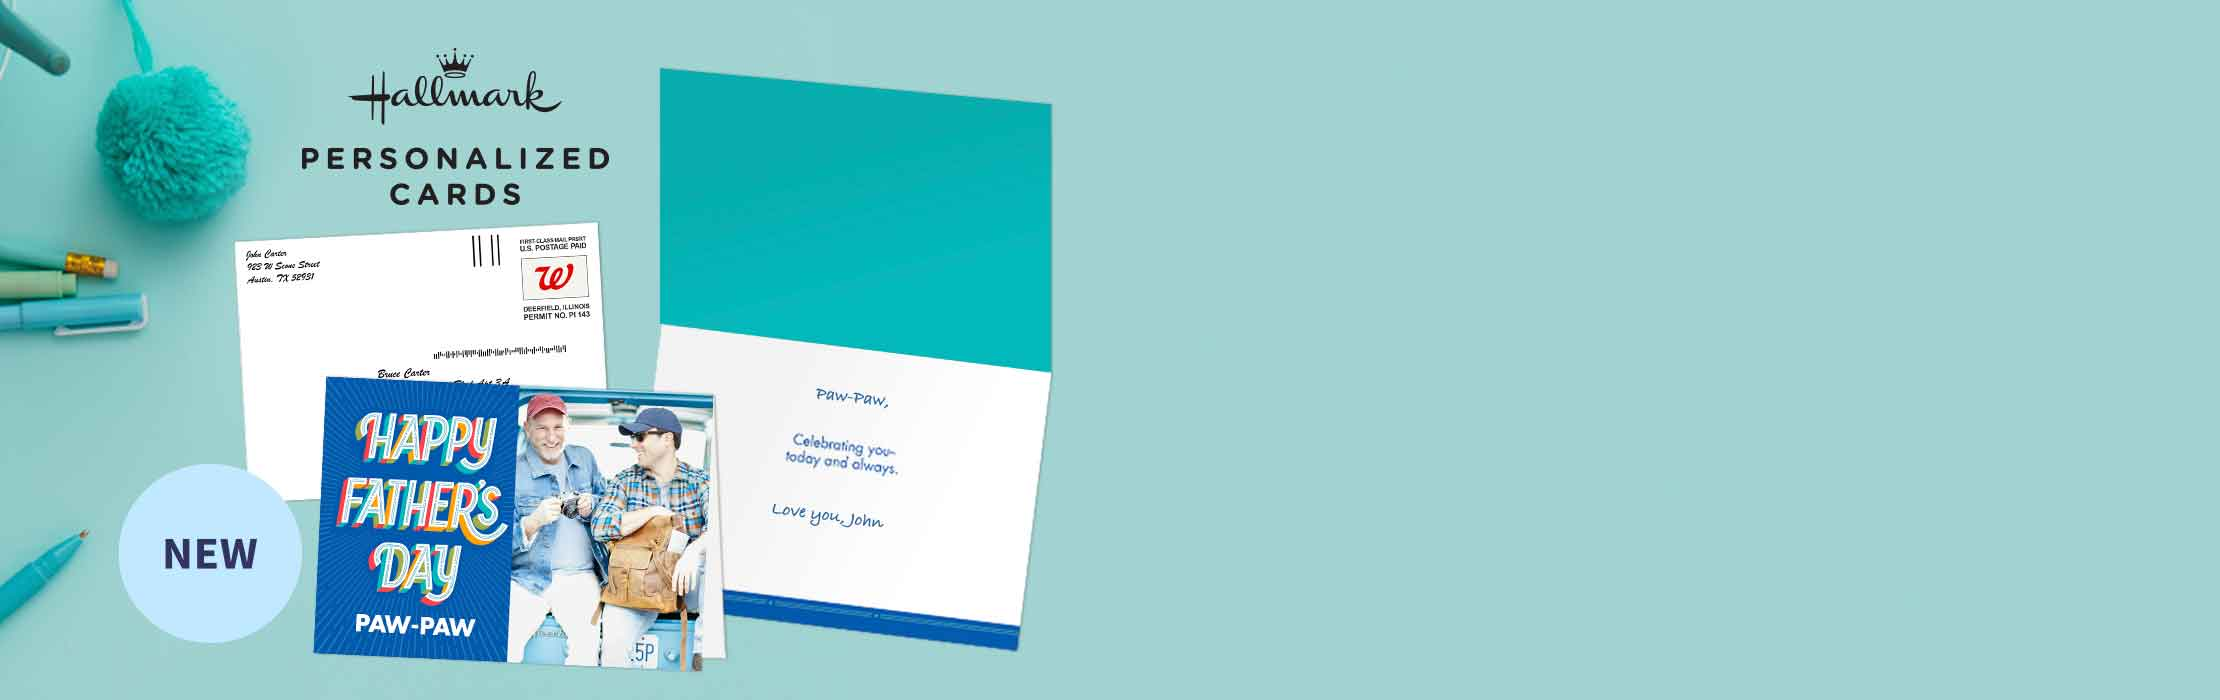 Make a Hallmark card that makes Dad smile